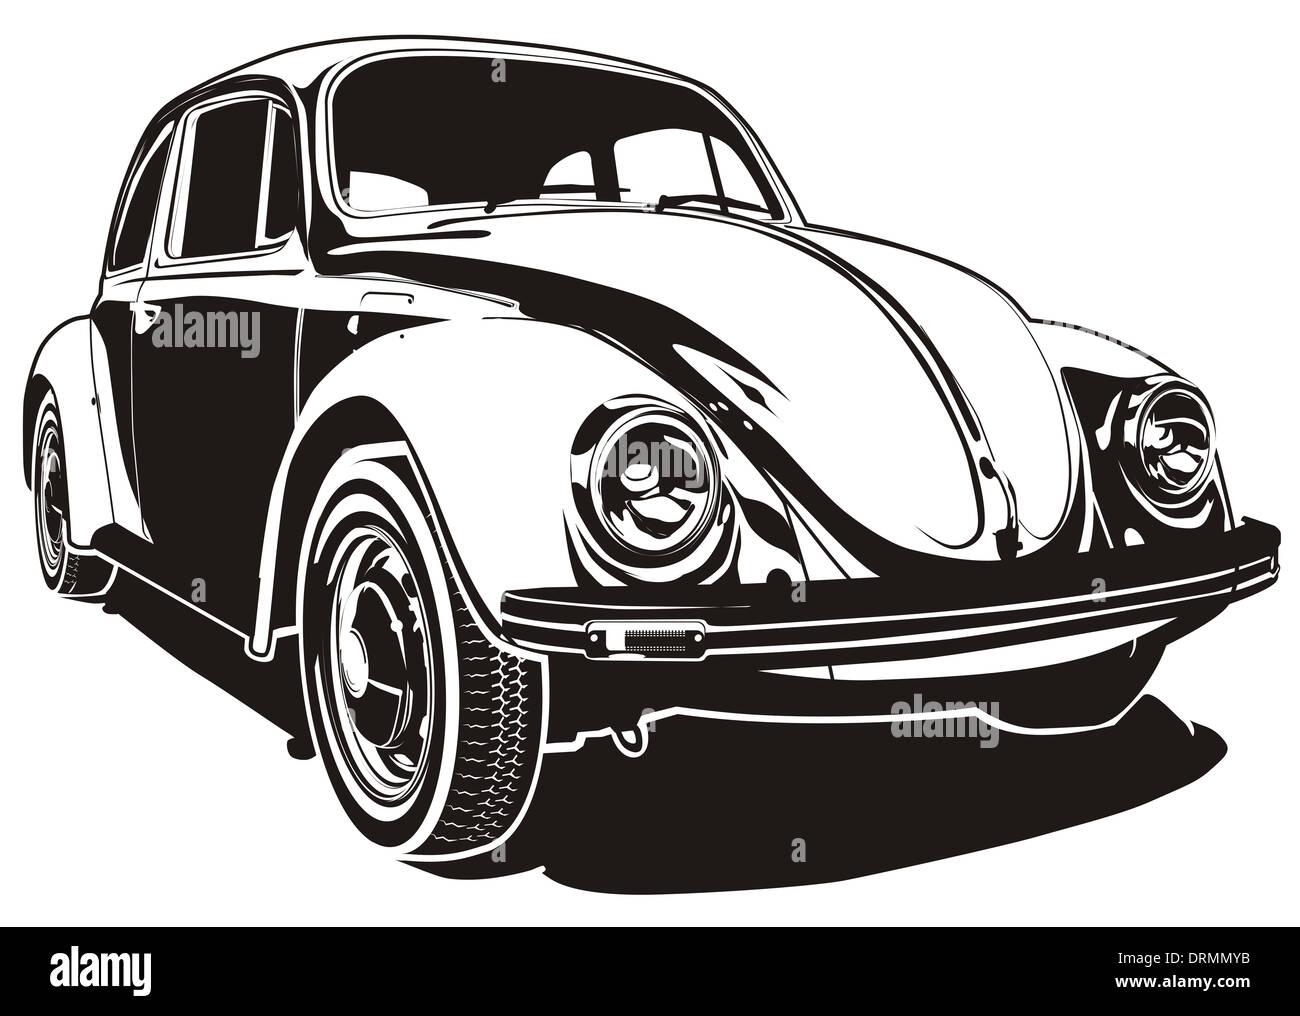 Retro Car Silhouette Stock Photo 66223679 Alamy